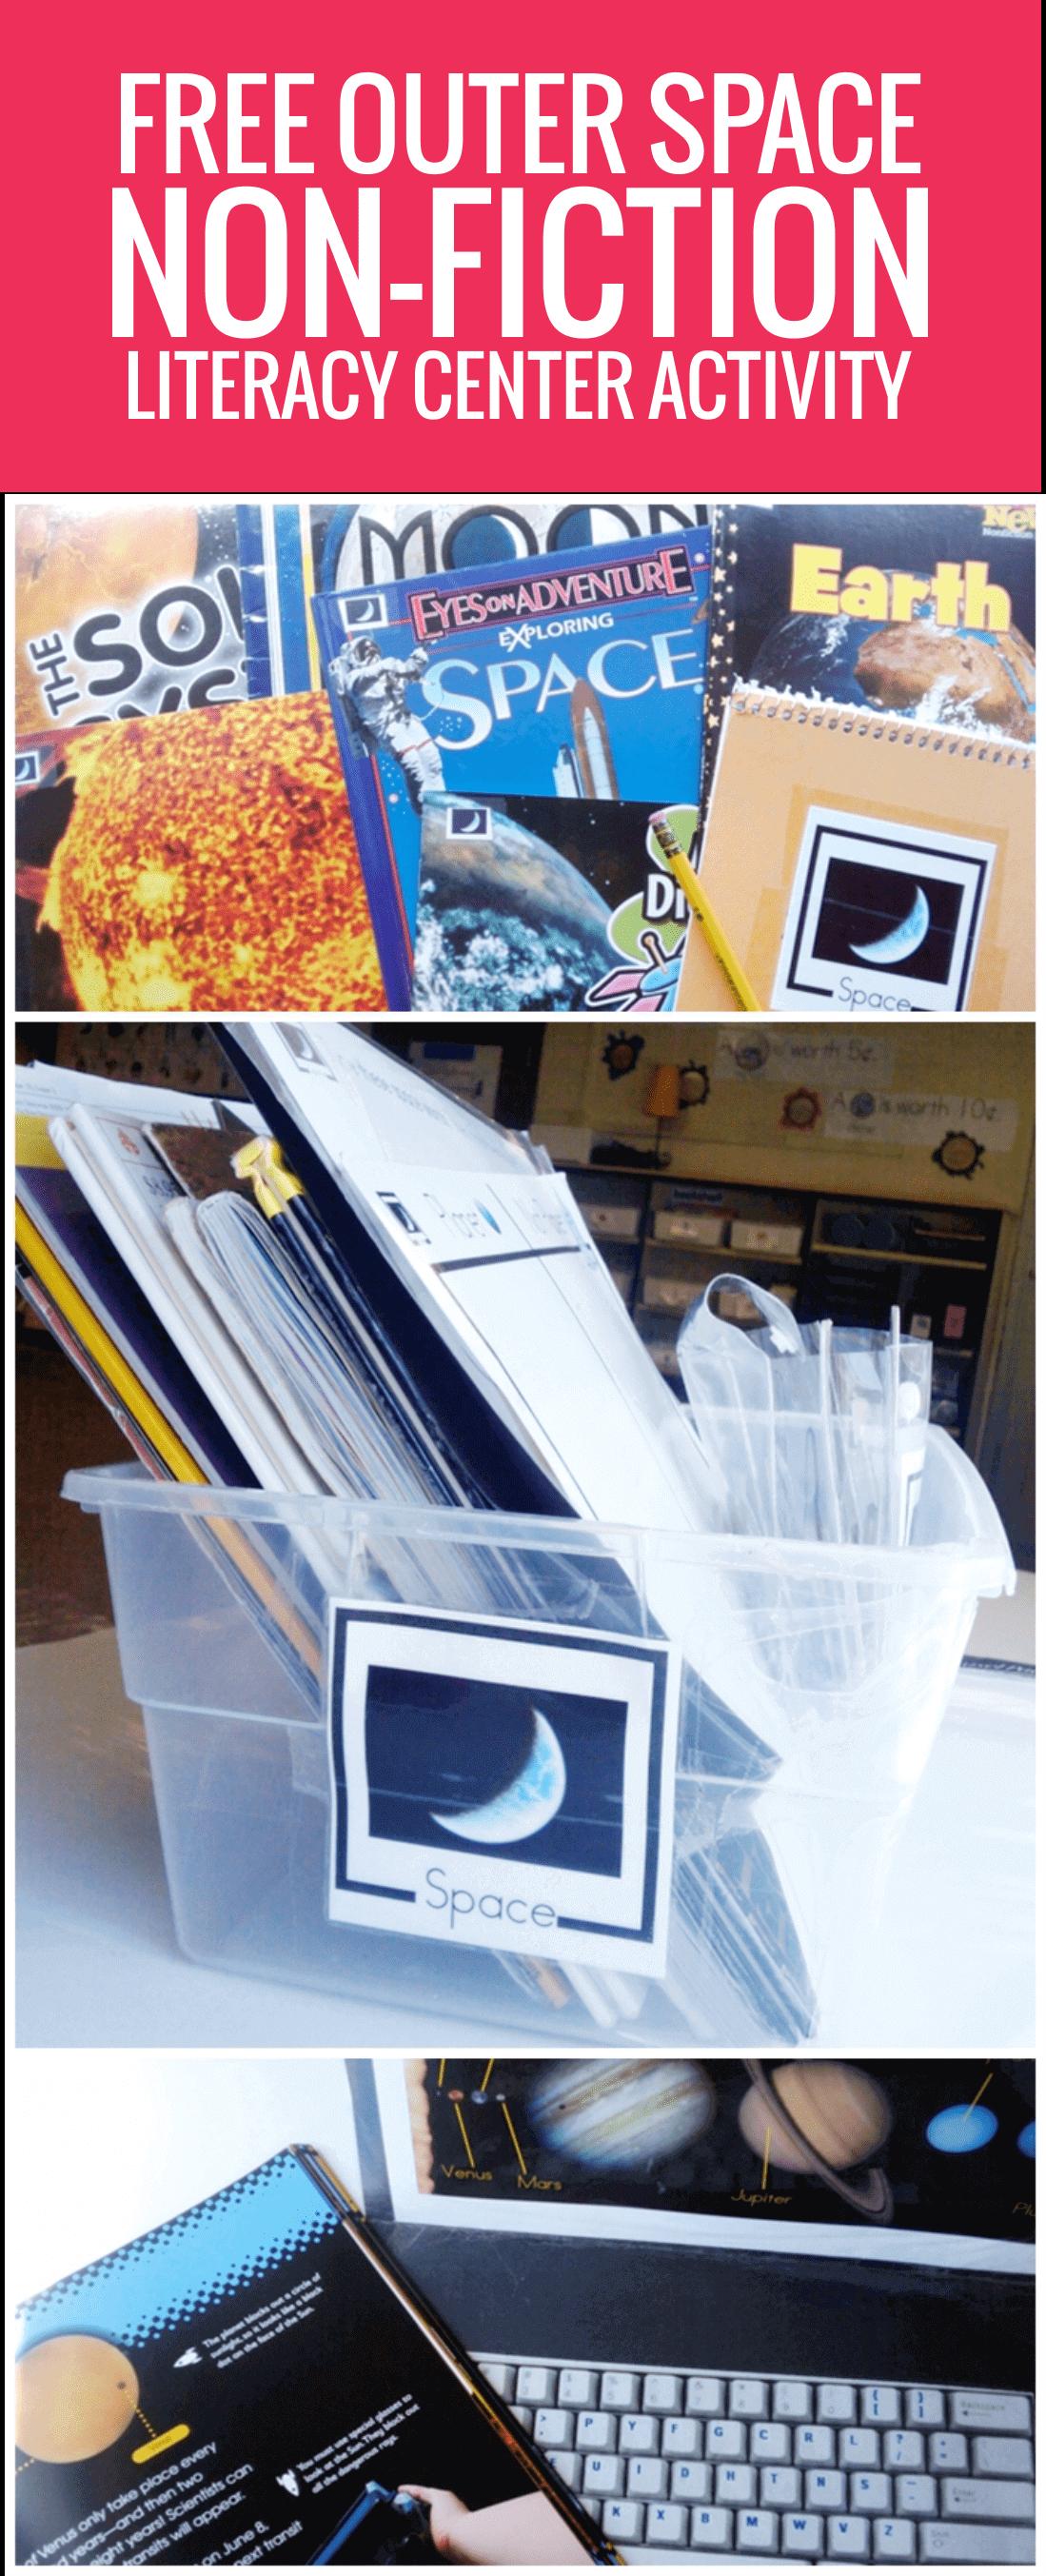 Space Non-fiction Literacy Center Activity Set